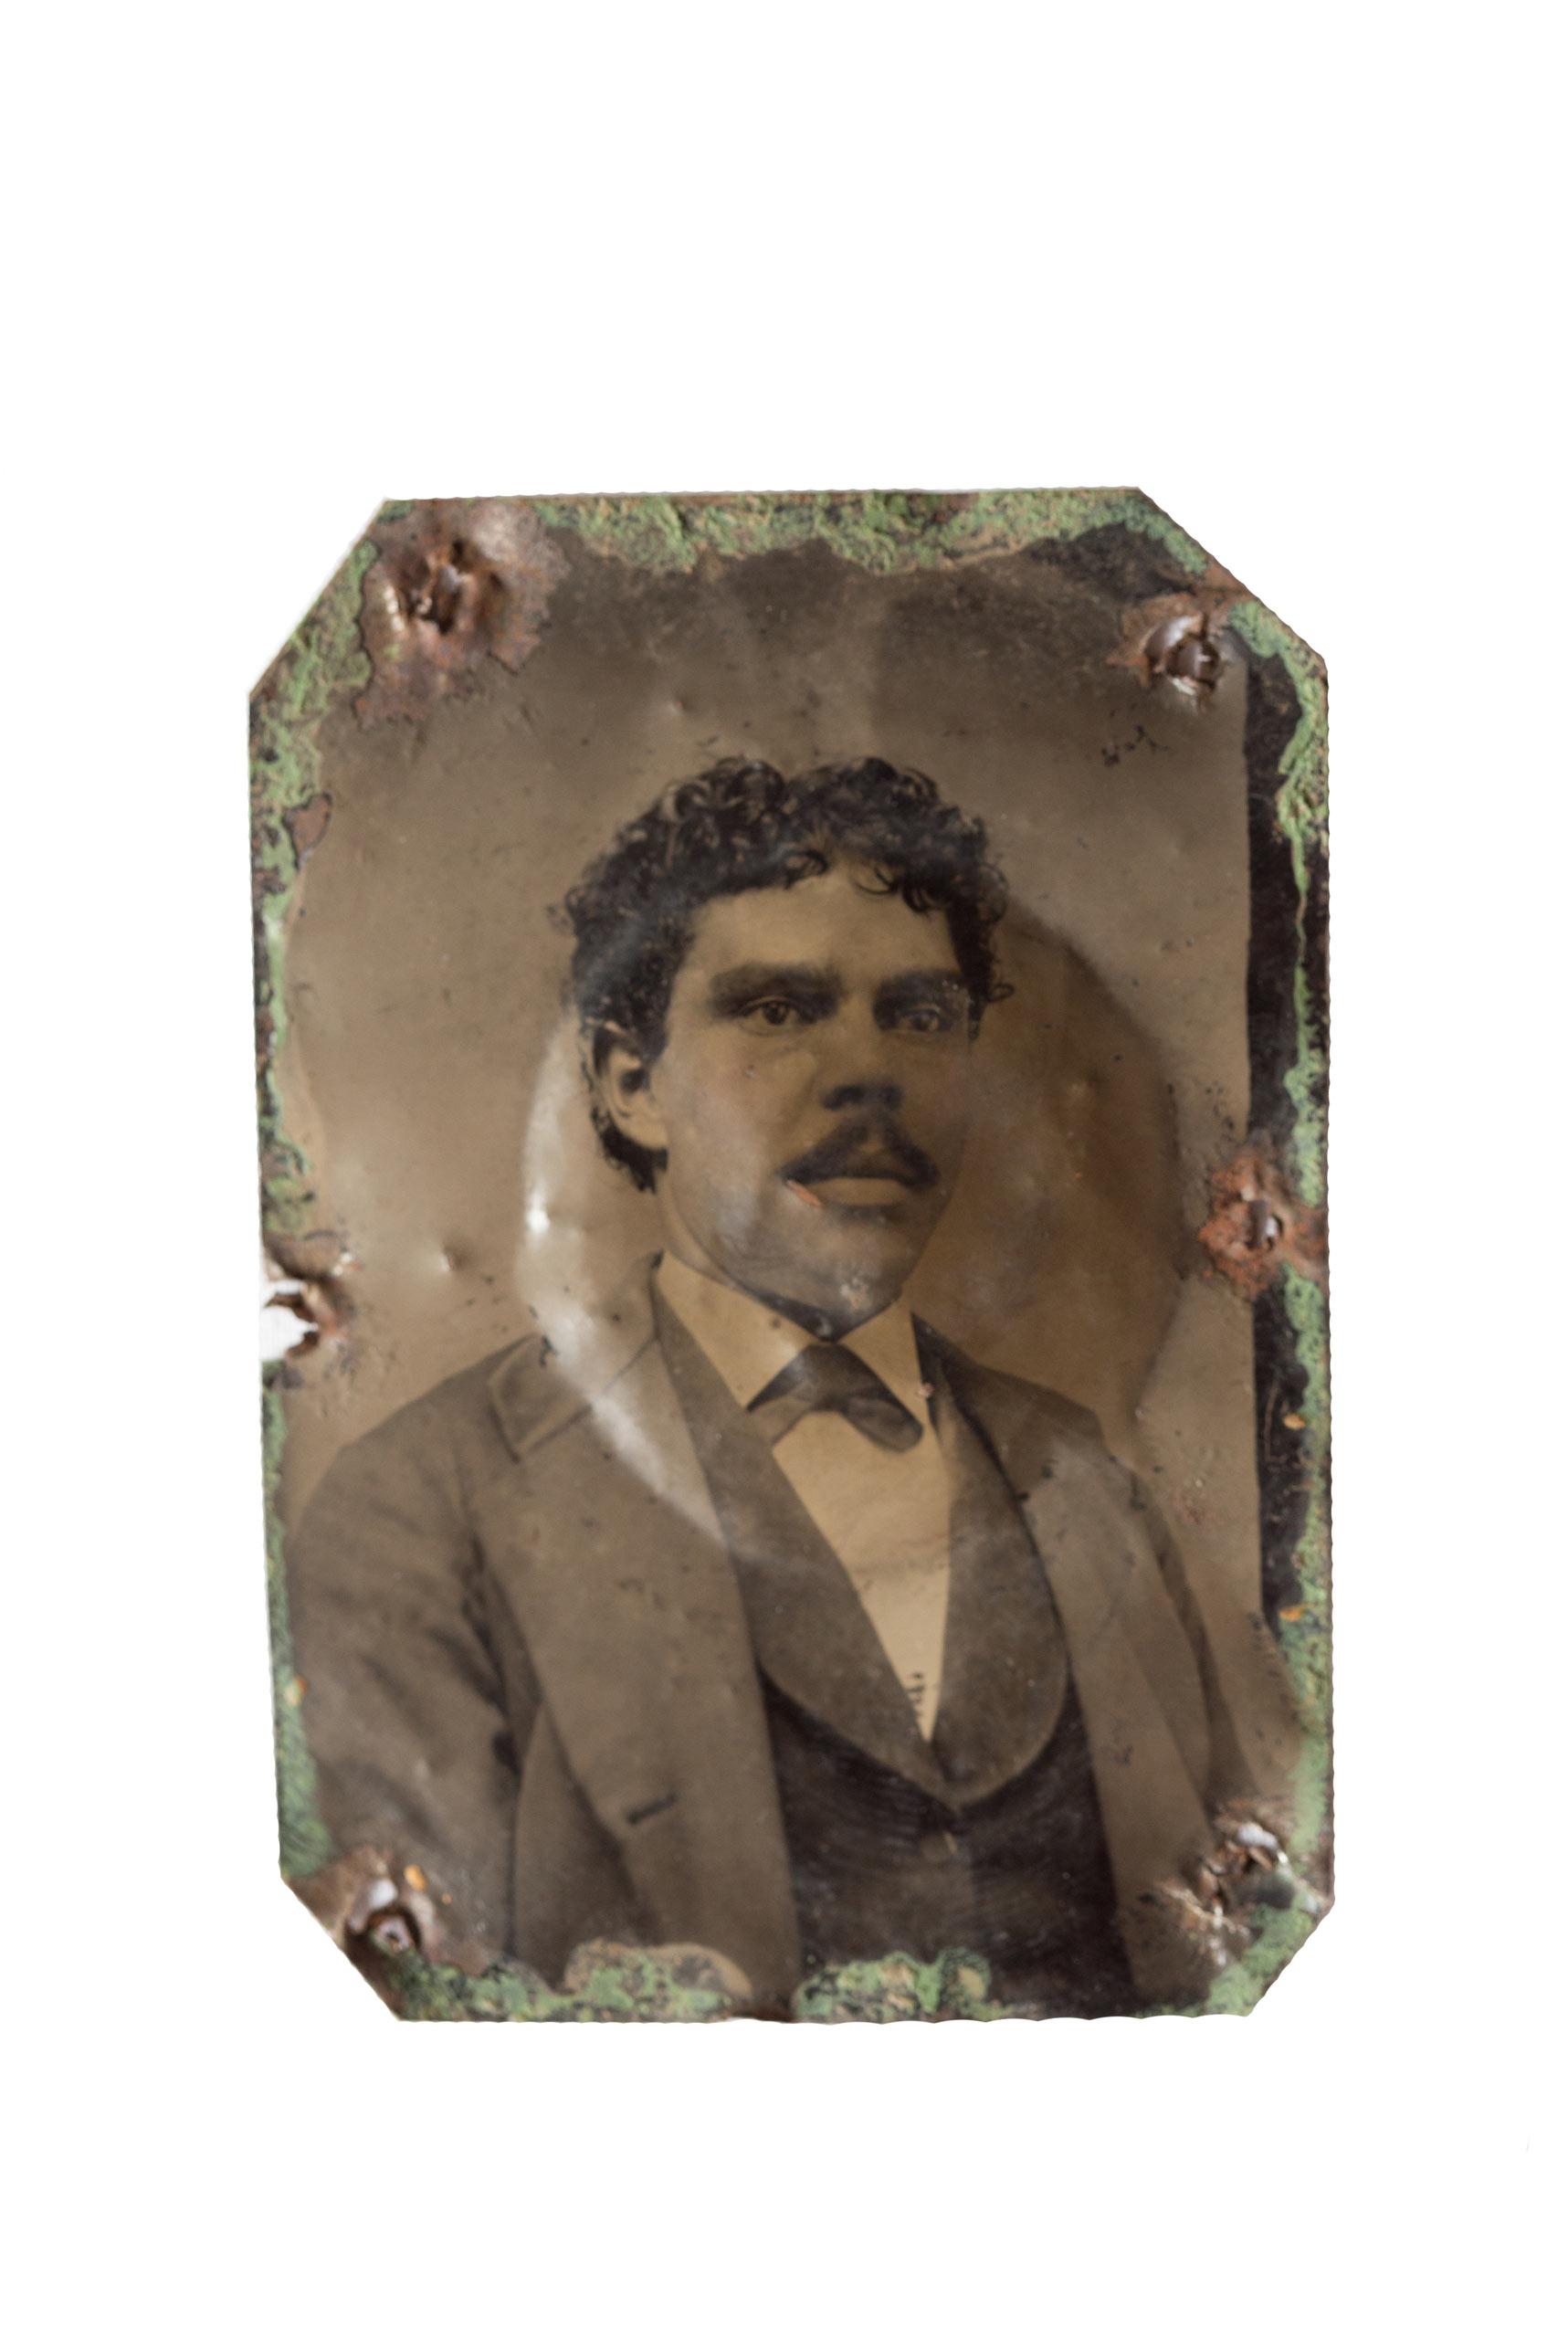 Unidentified Native American man.